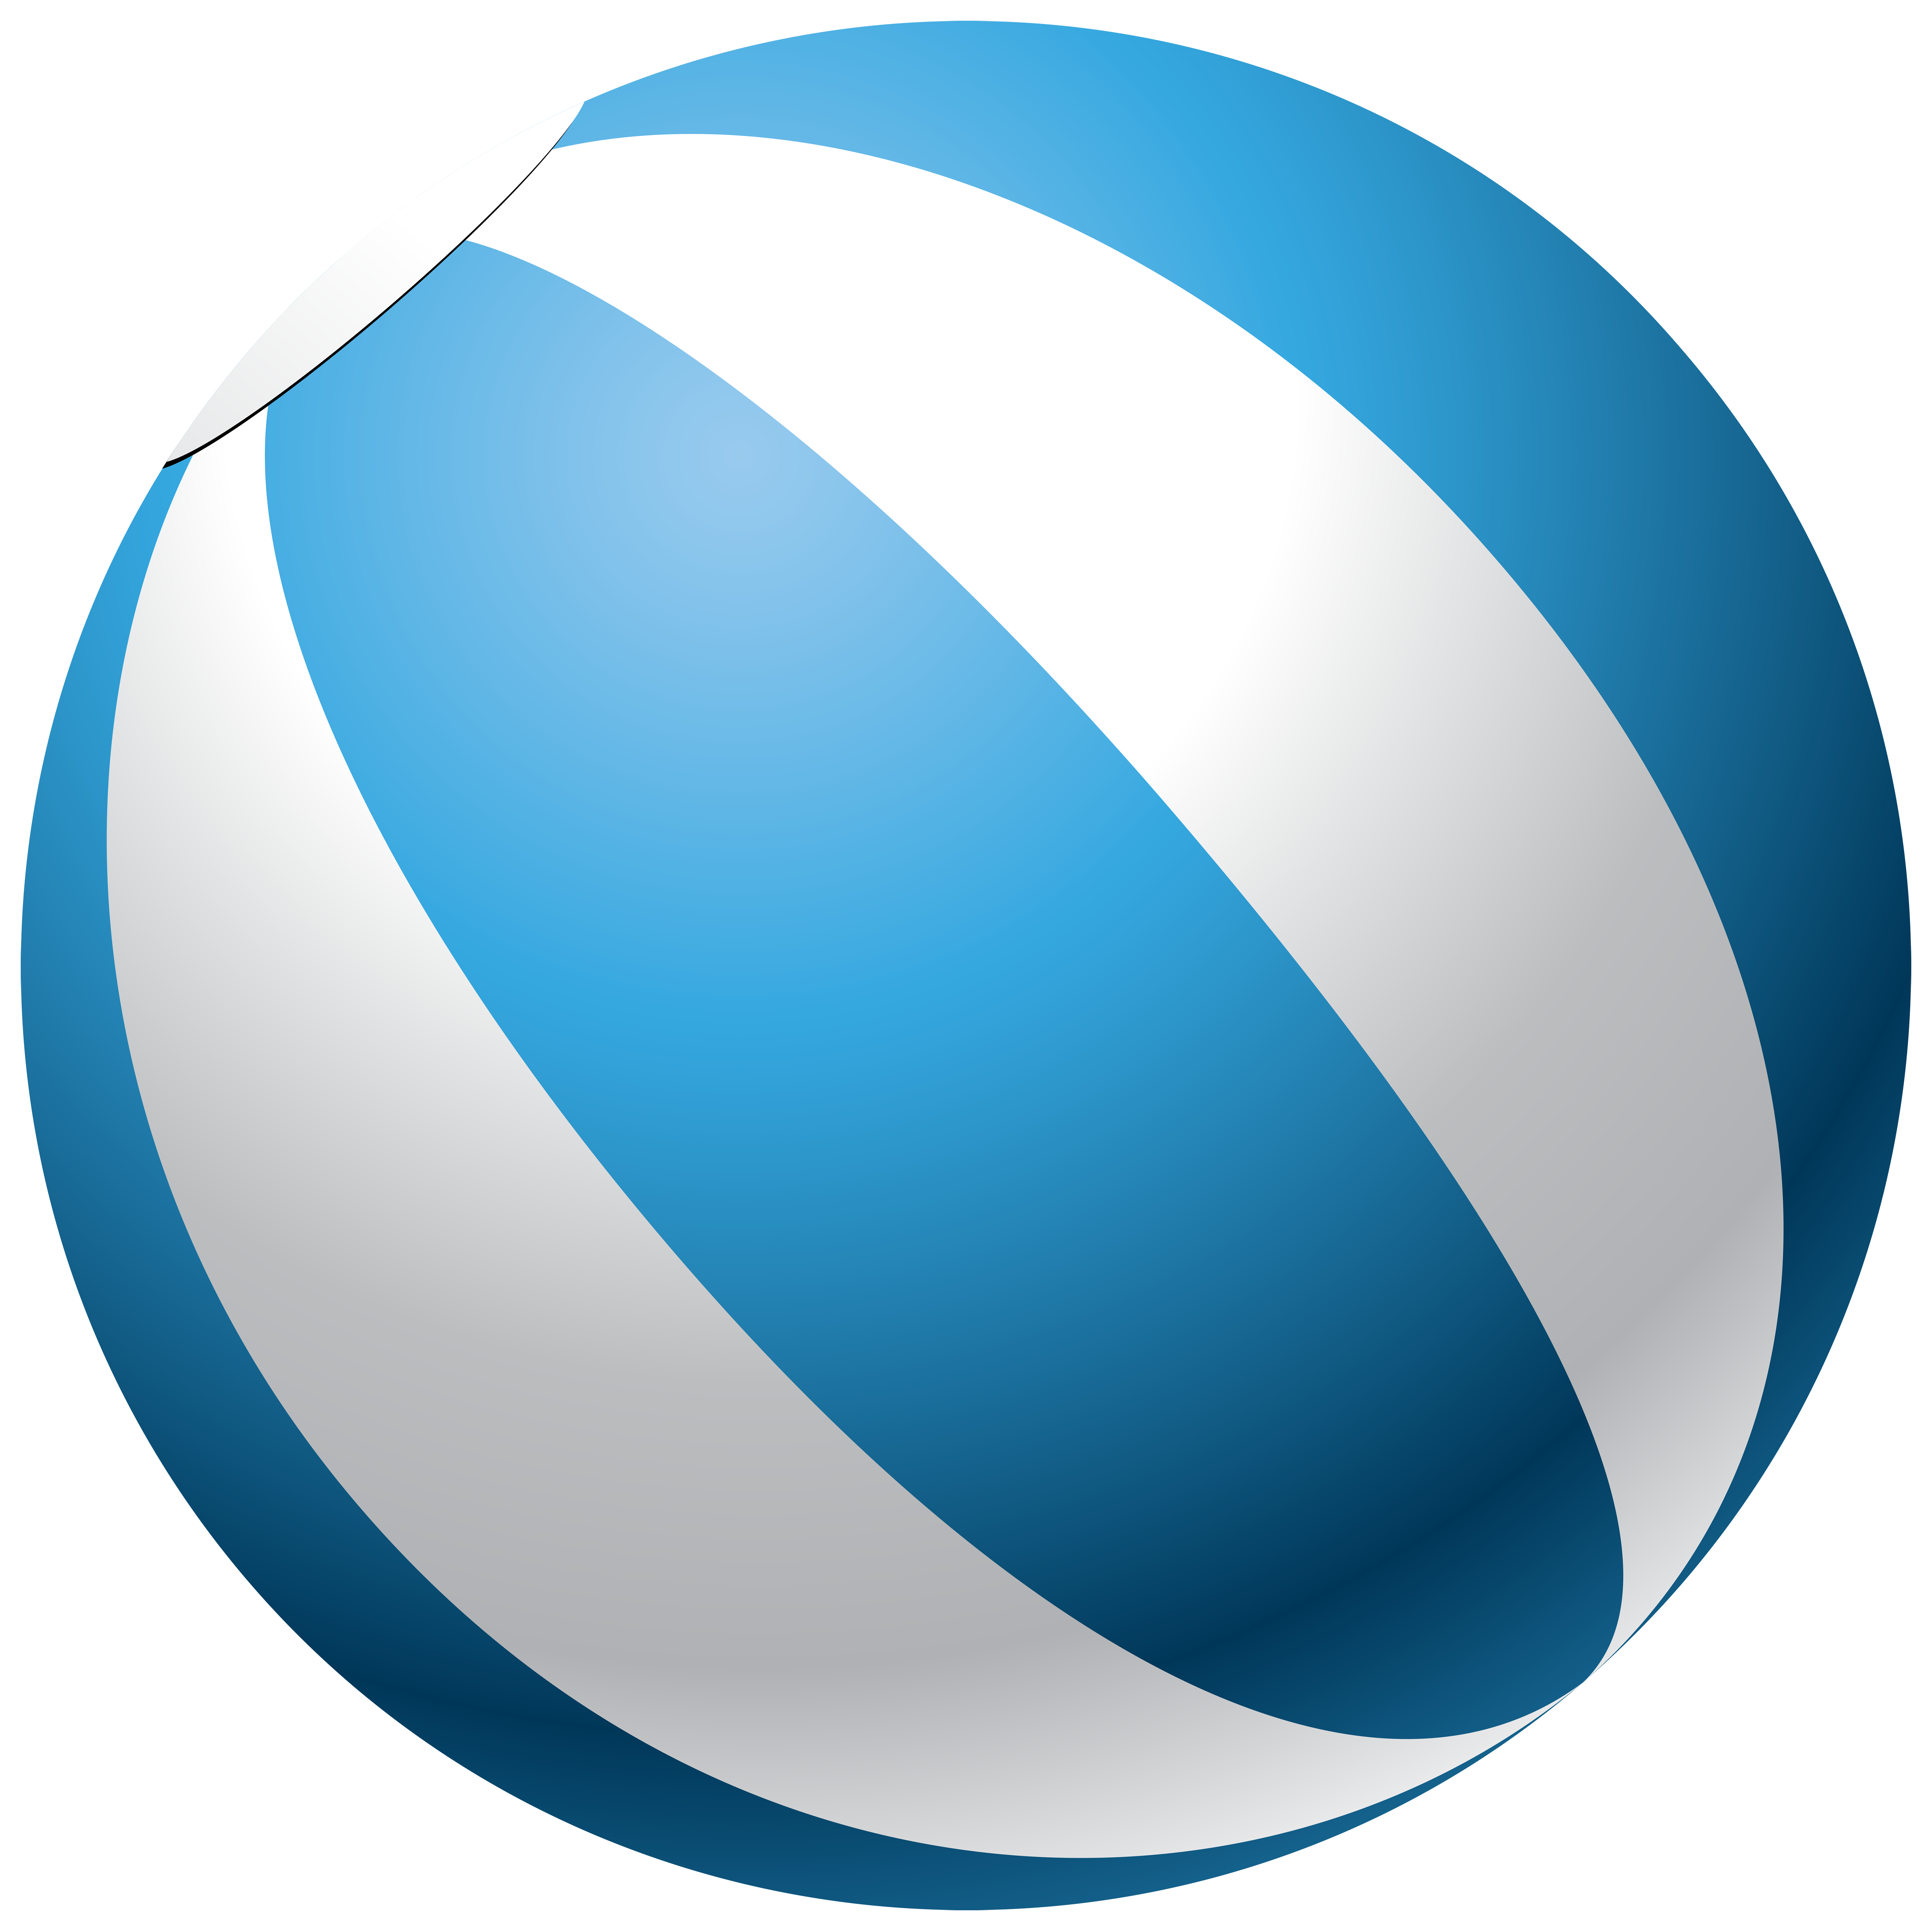 Beach ball transparent clip. Sunny clipart blue